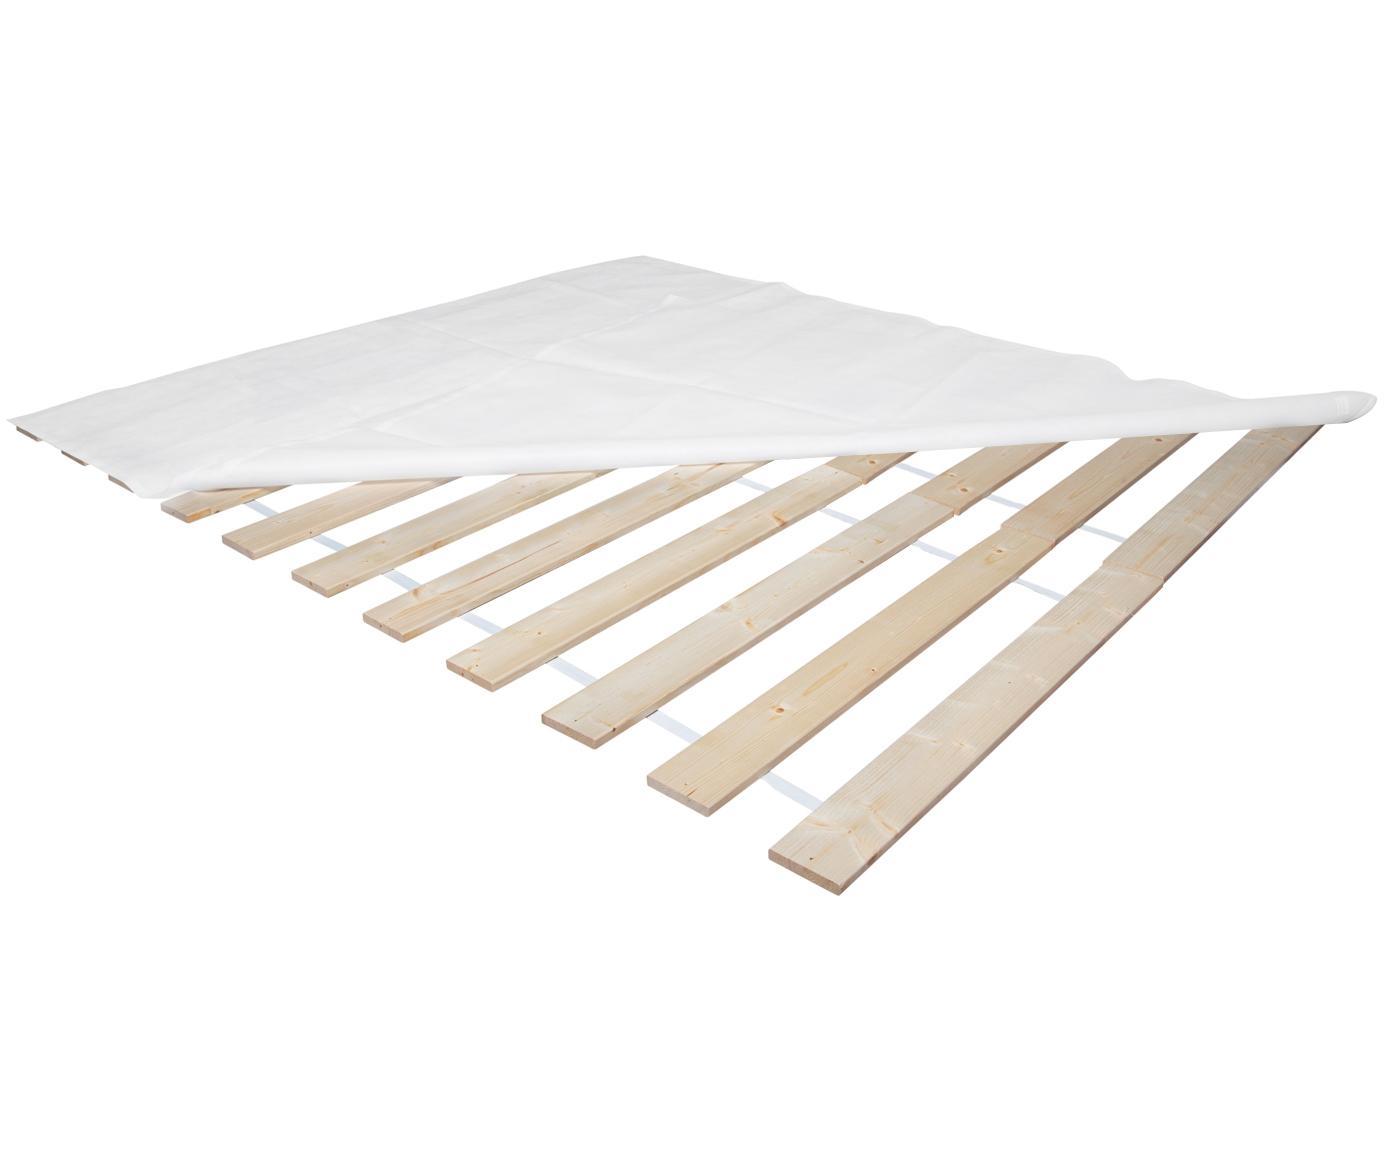 Rollrost 2er-Set Juan Carlos, Leisten: Massives Tannenholz, Leisten: Helles HolzAbdeckung: weiß, 160 x 200 cm